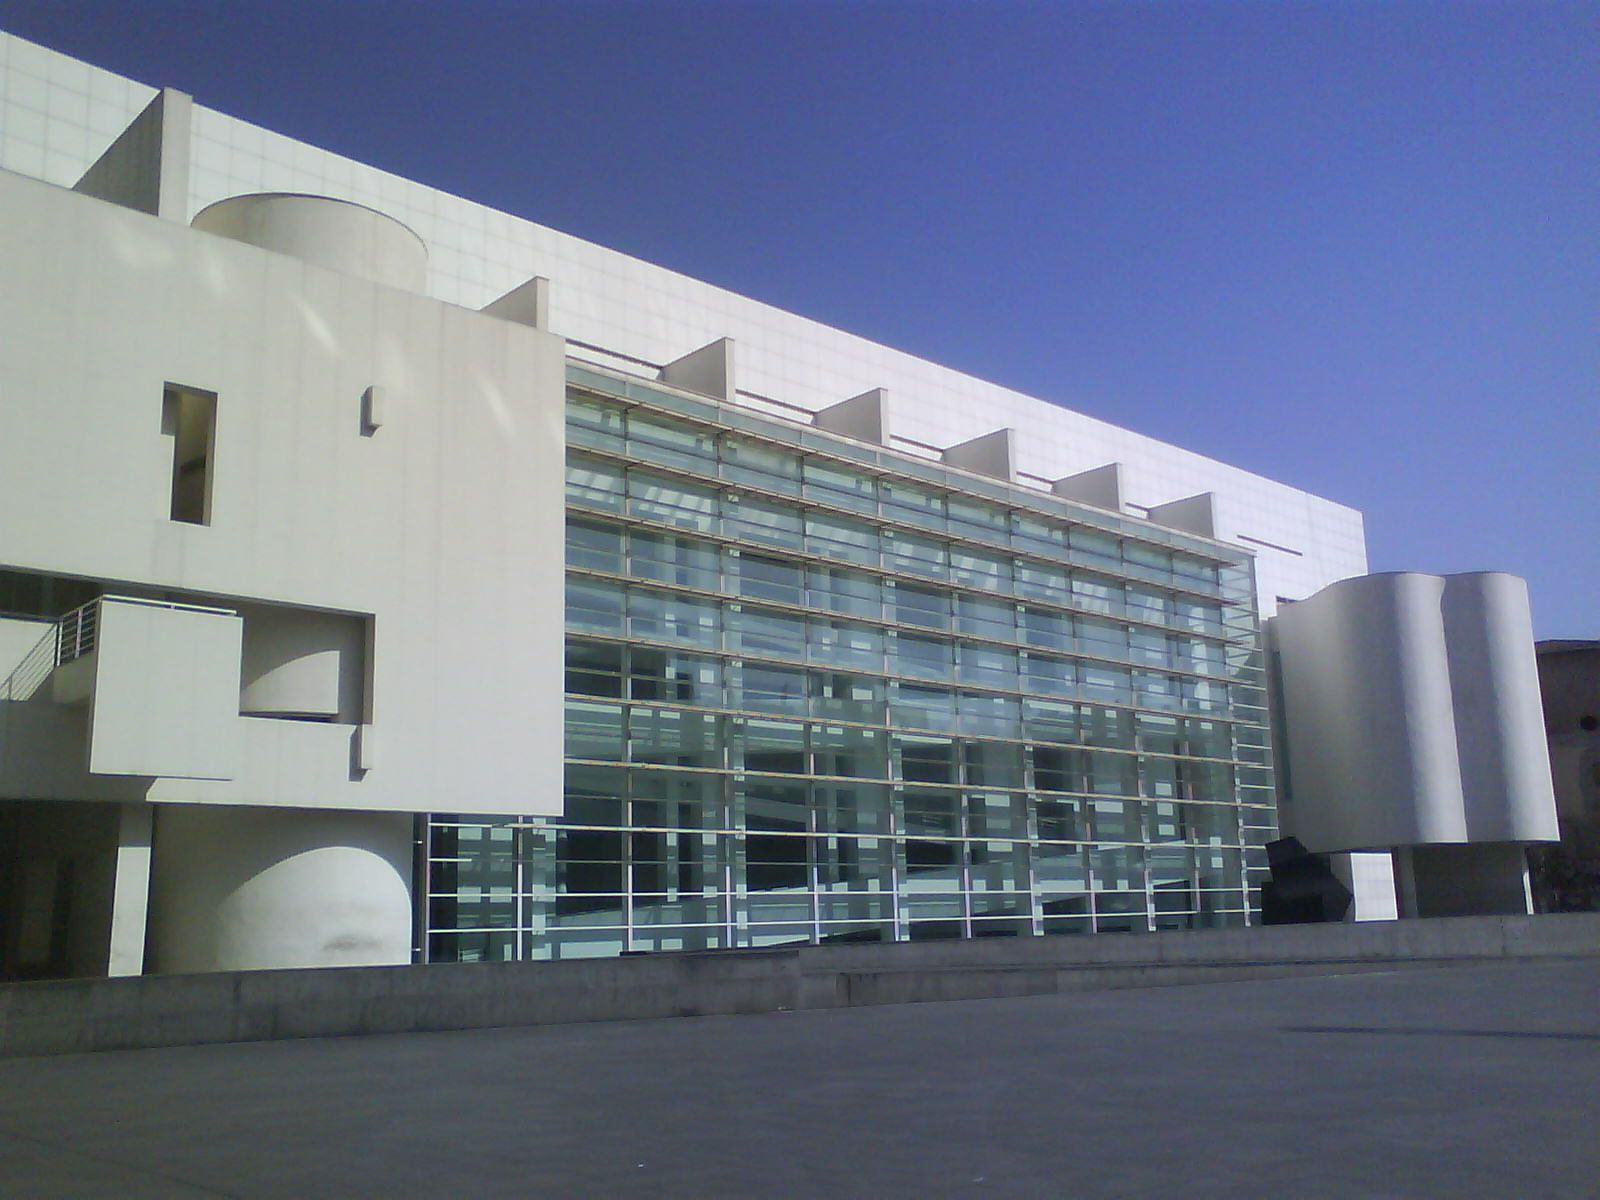 MACBA: Museu dArt Contemporani de Barcelona